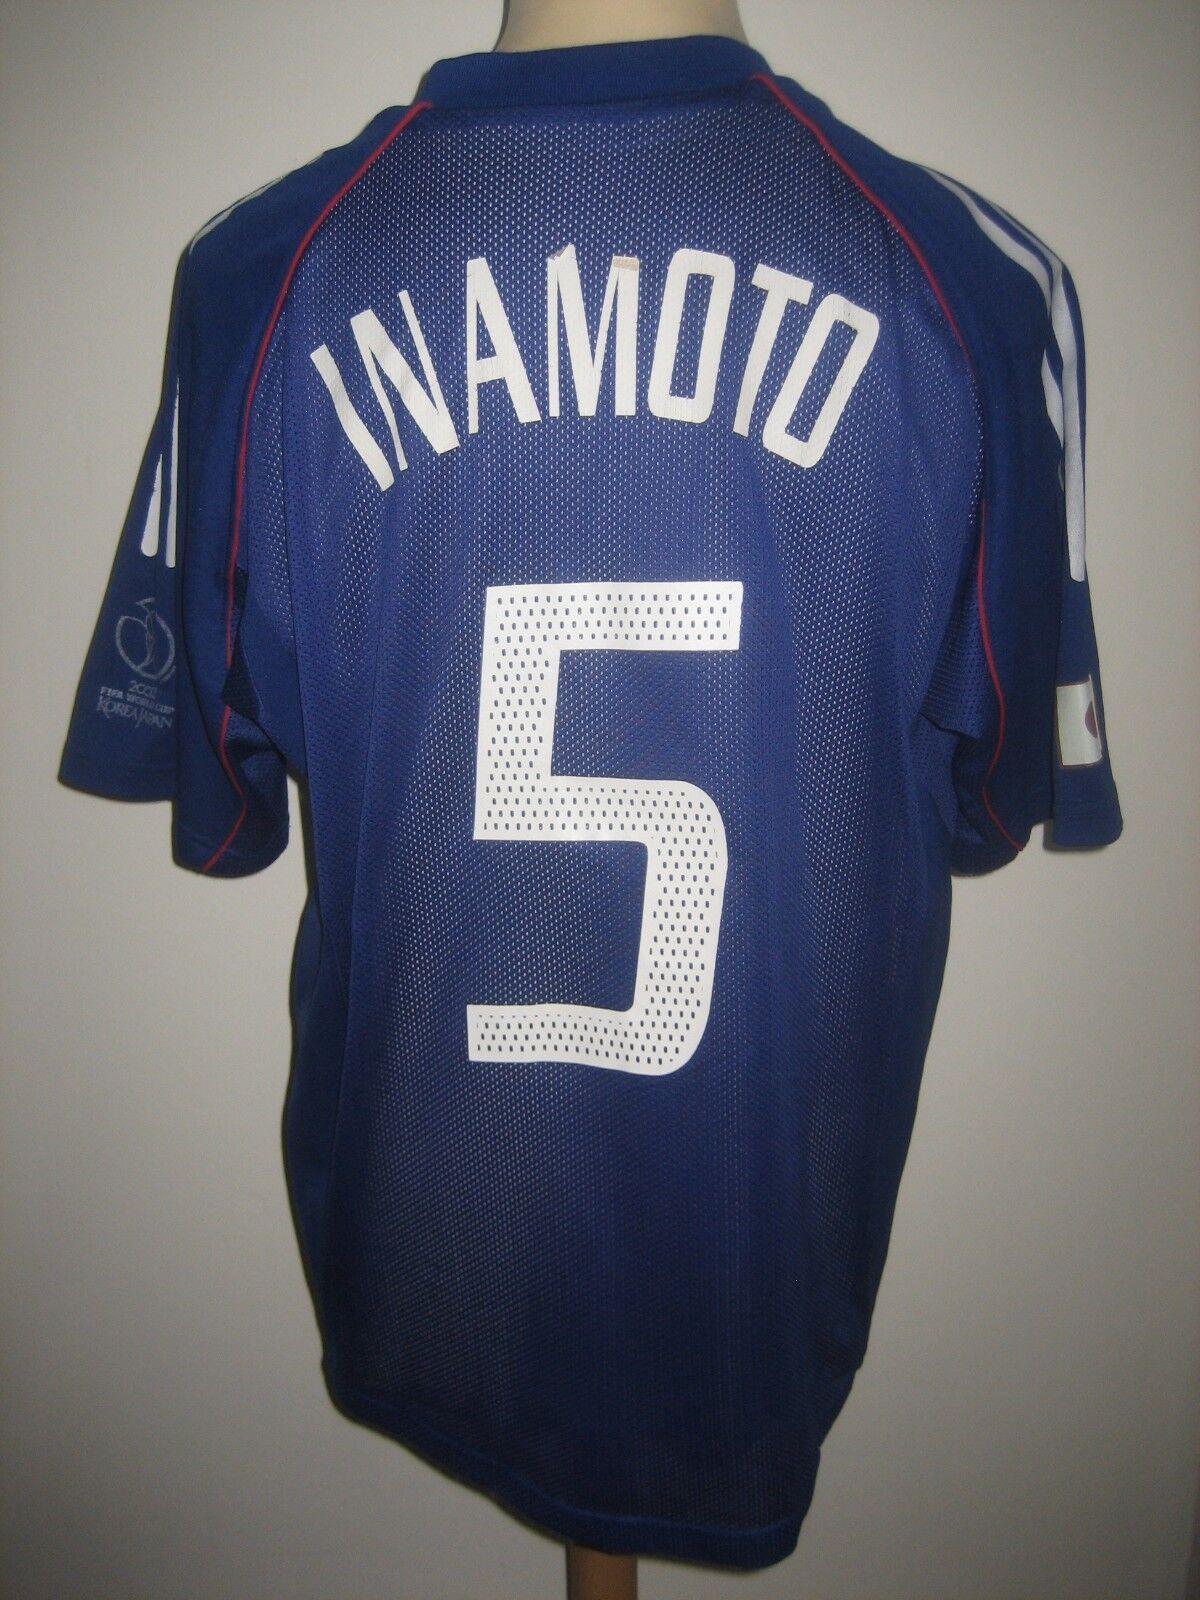 Japan MATCH WORN Inamoto football shirt soccer jersey trikot maillot Talla L